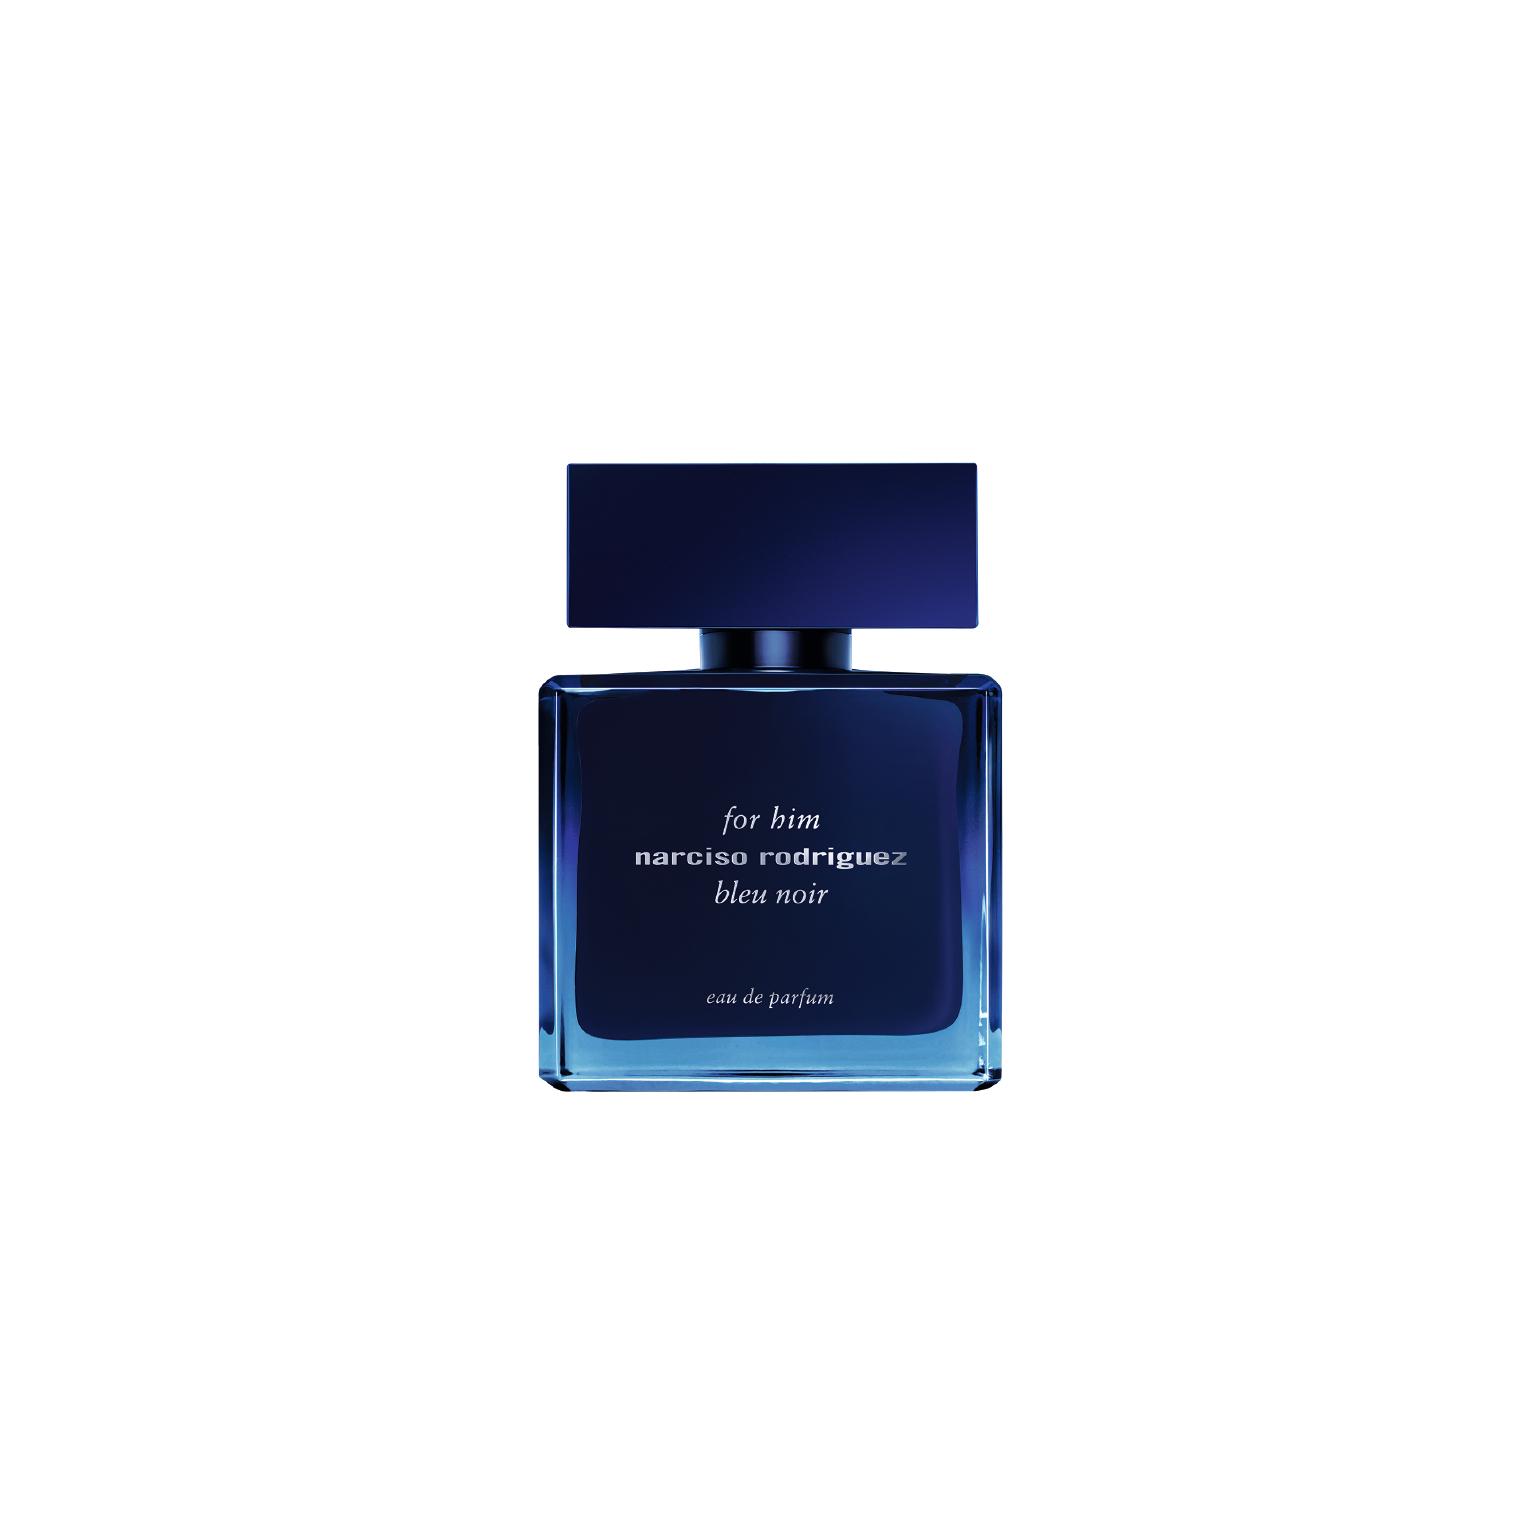 Narciso Rodriguez Bleu Noir For Him EDP, 50 ml